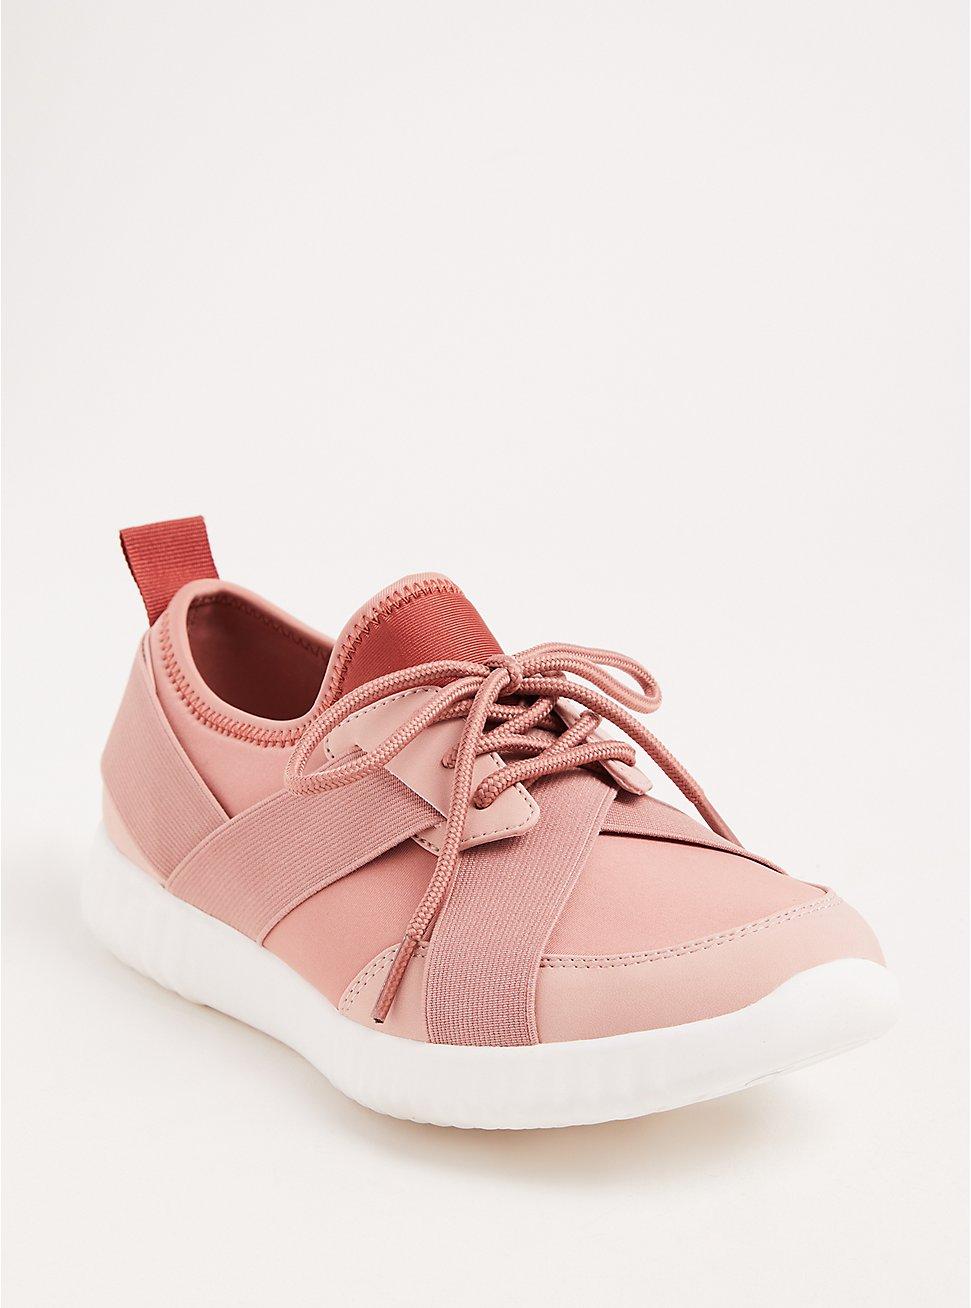 Plus Size Pink Two-Tone Strappy Sneakers (WW), BLUSH, hi-res